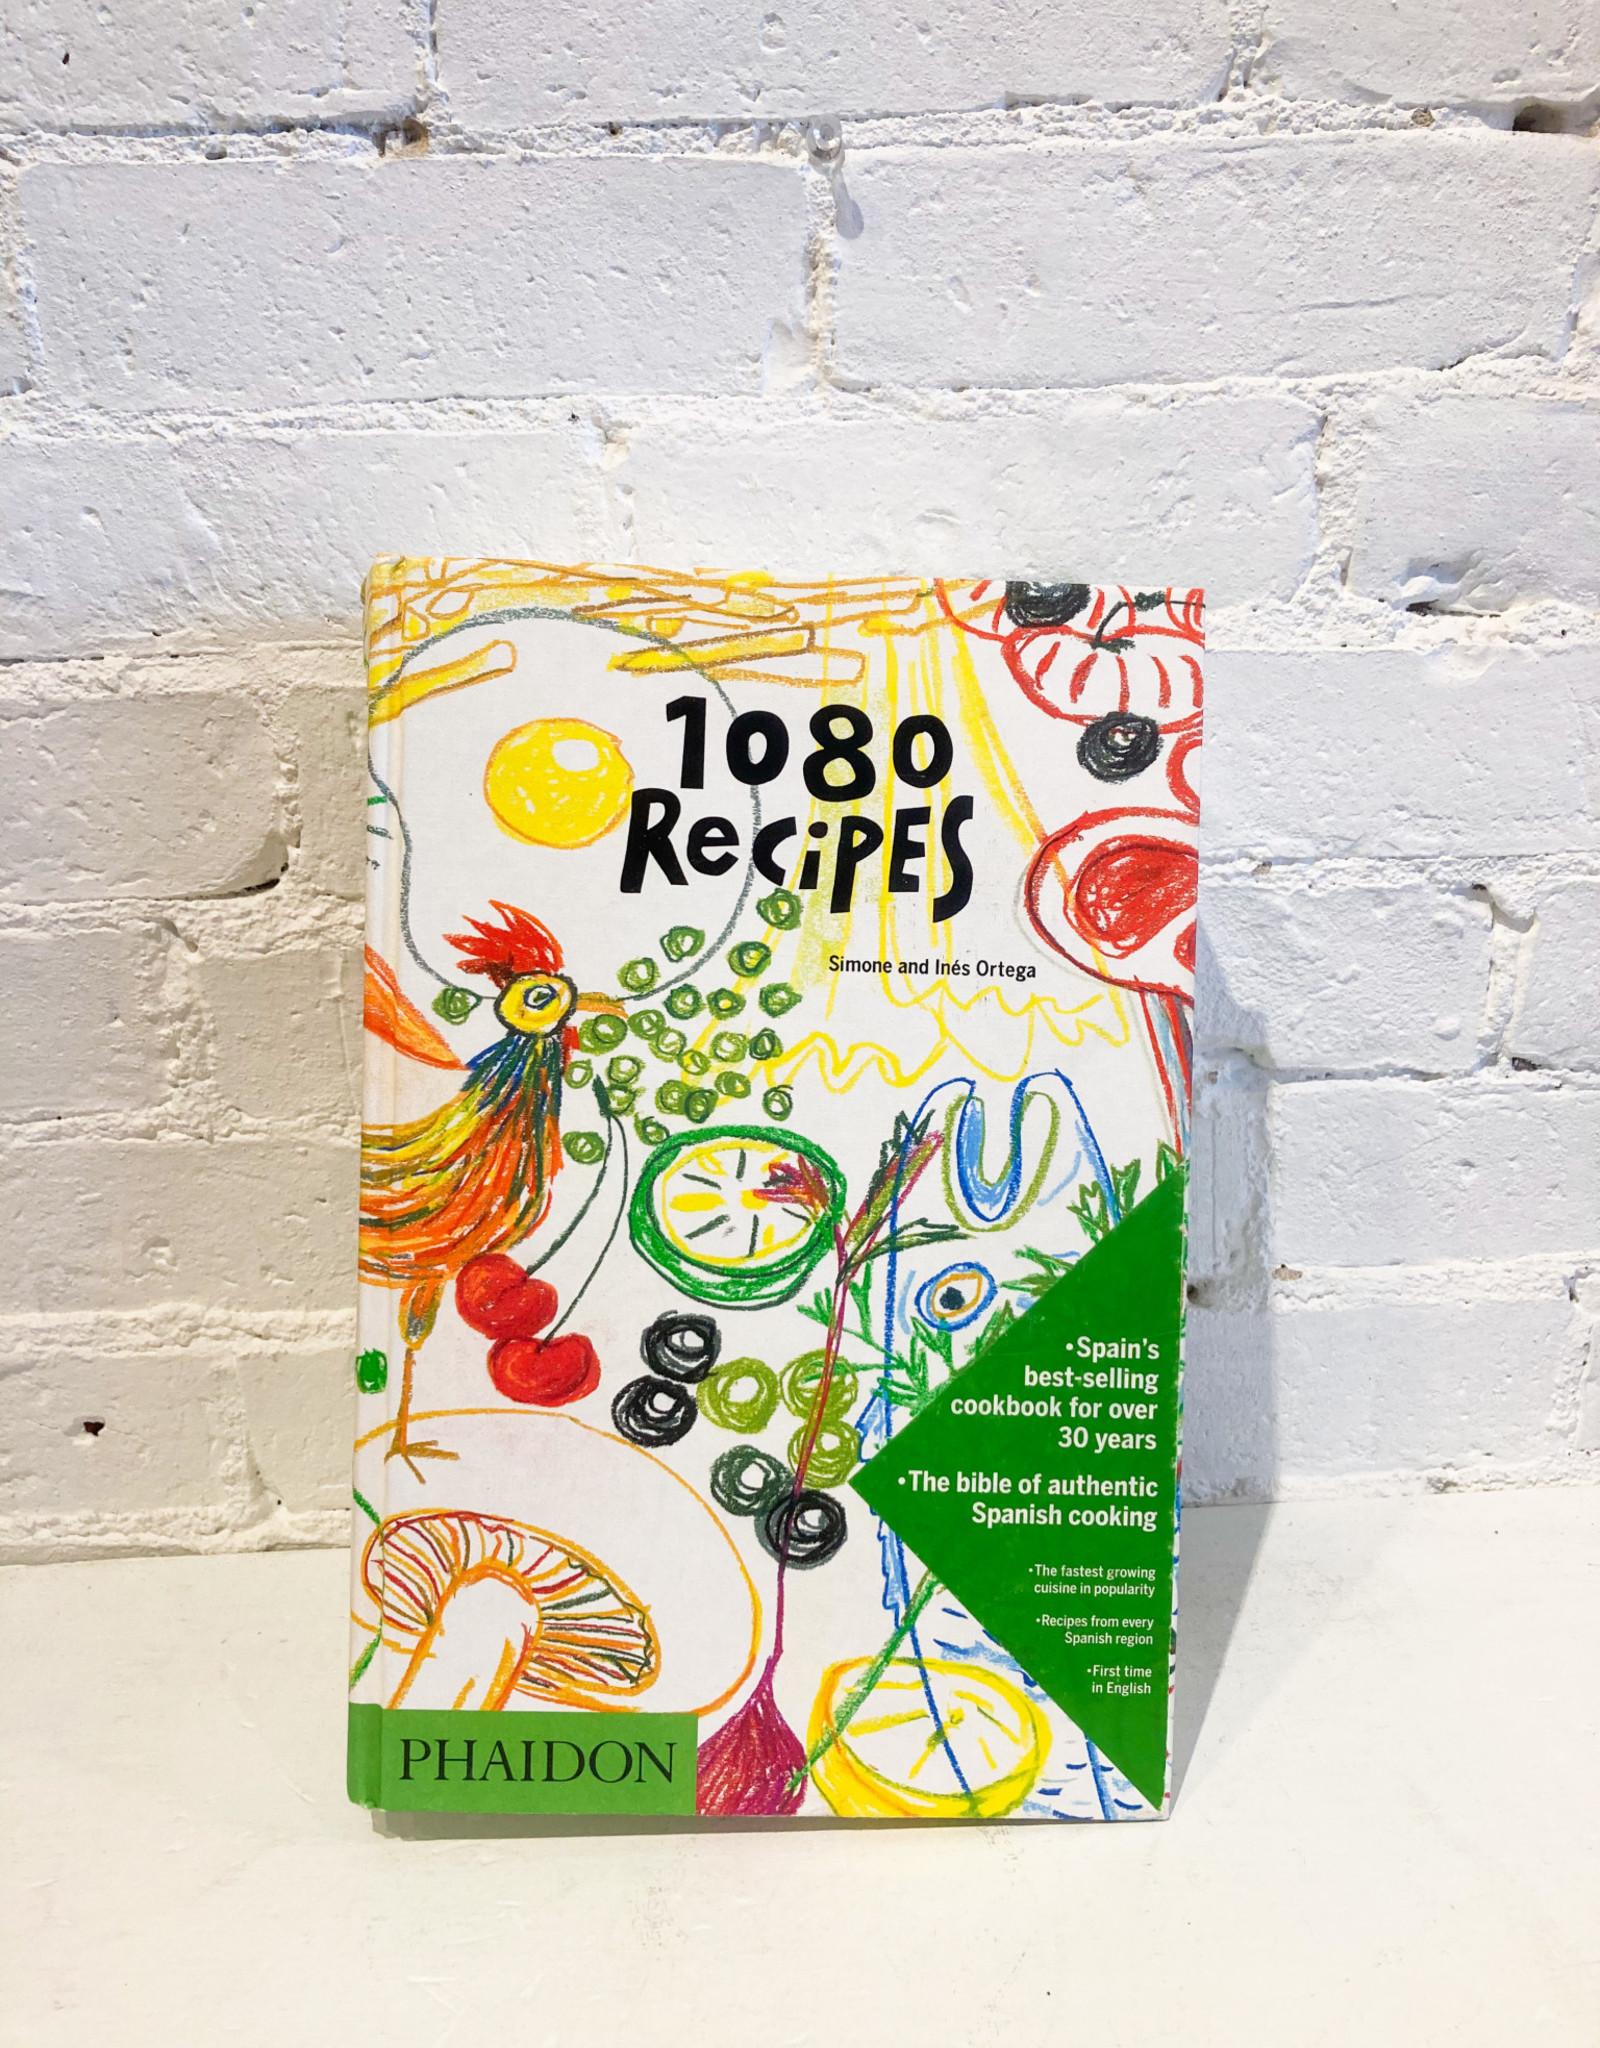 1080 Recipes by Simone and Inés Ortega